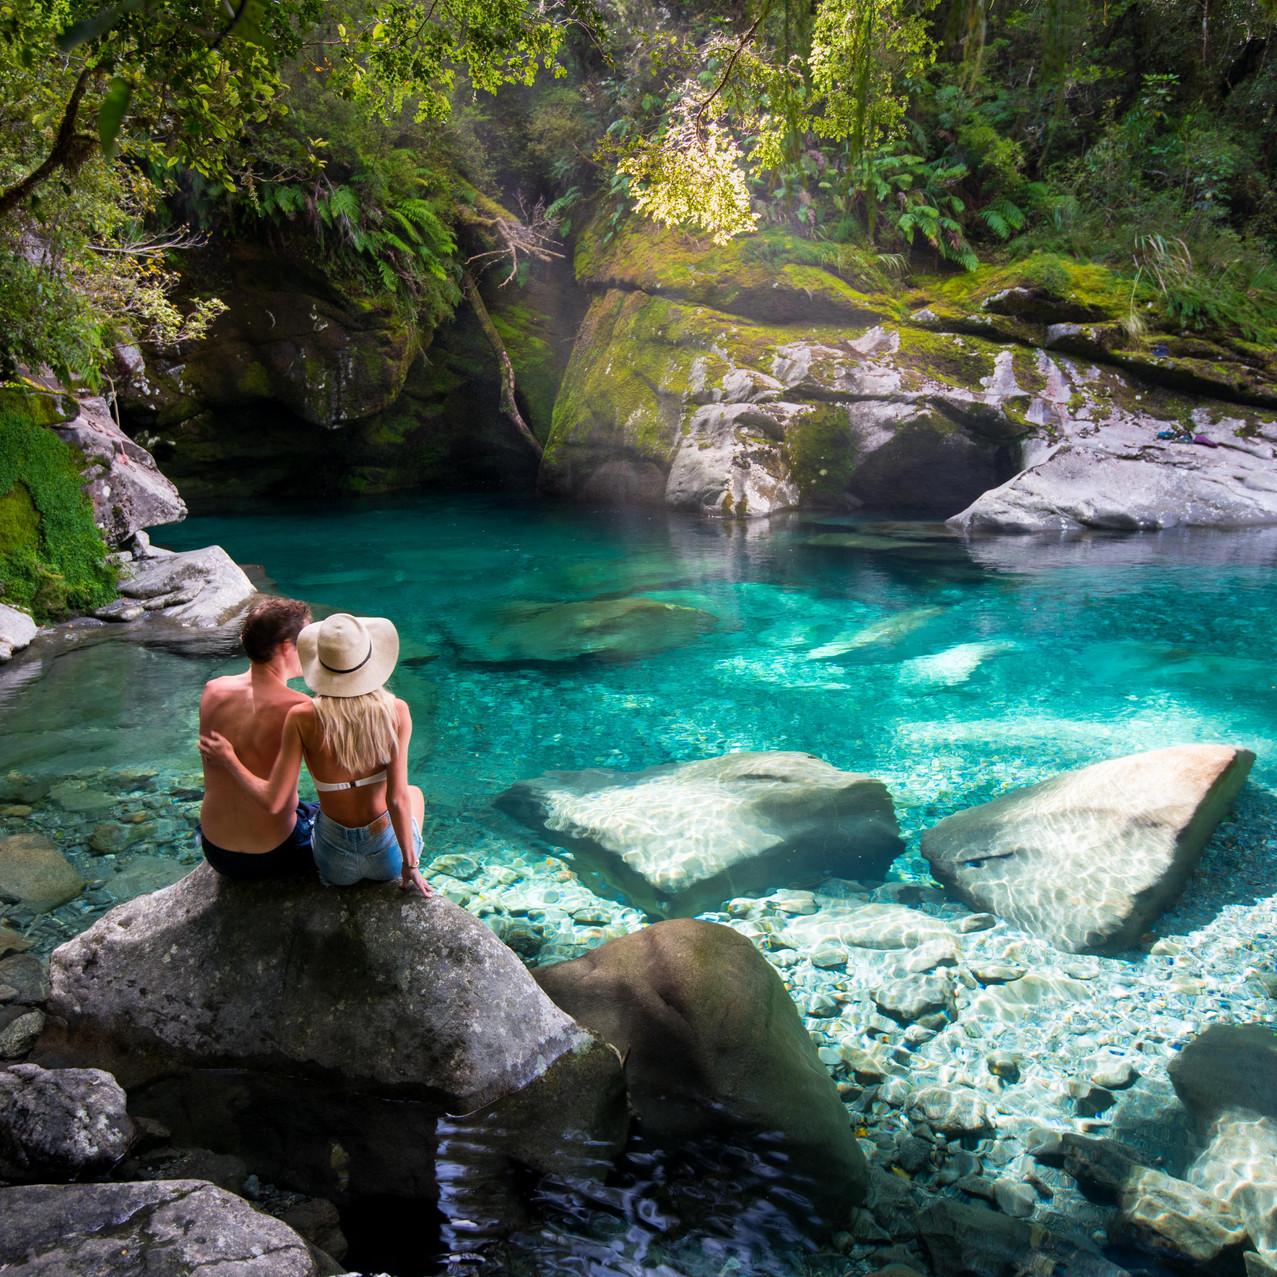 Blue Pool Secret Hidden Chasm Milford Sound